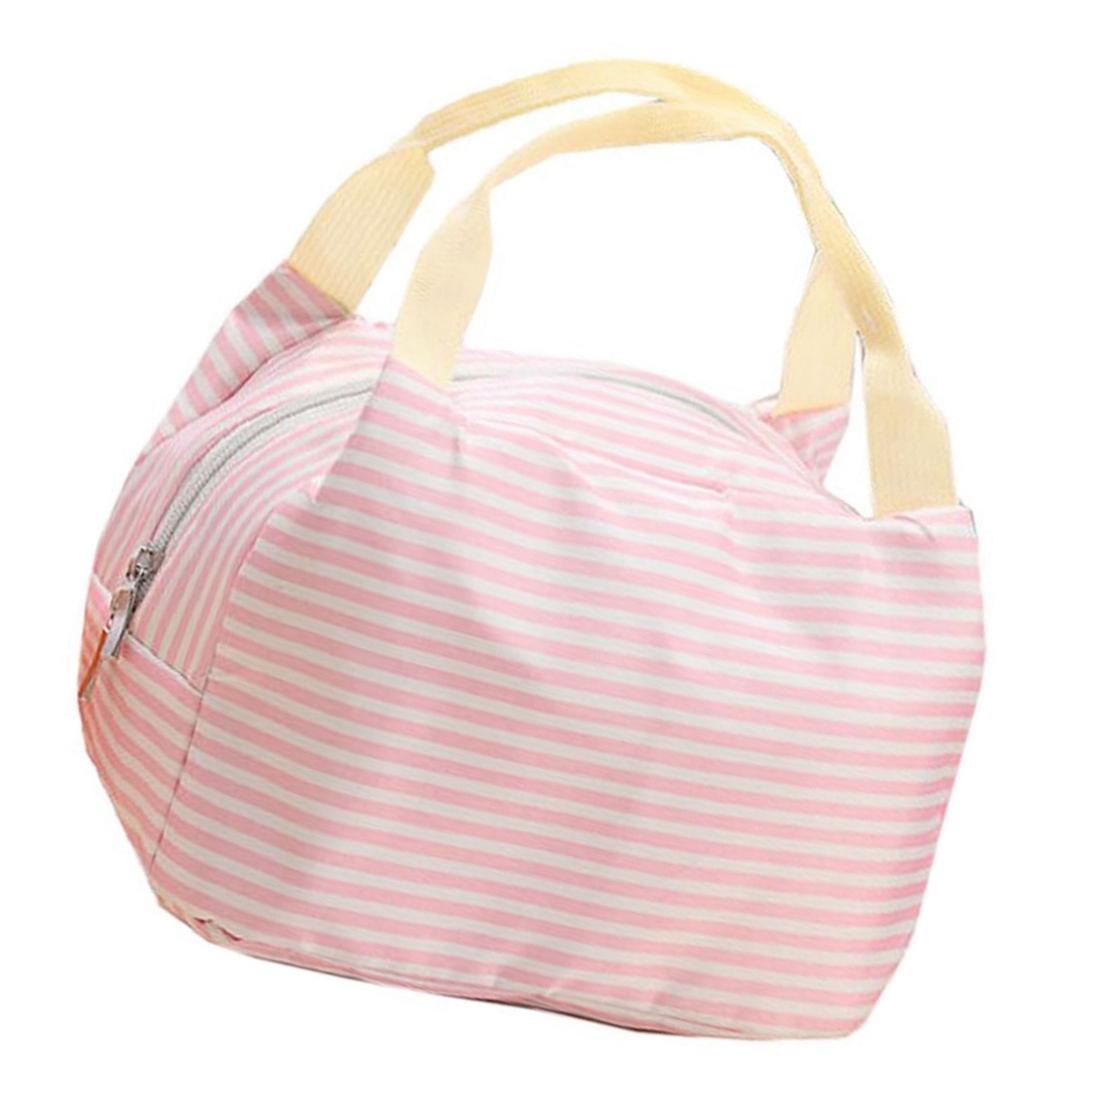 Bolsa de almuerzo bolsa termica aislada bolsa de picnic - Bolsa de almuerzo ...